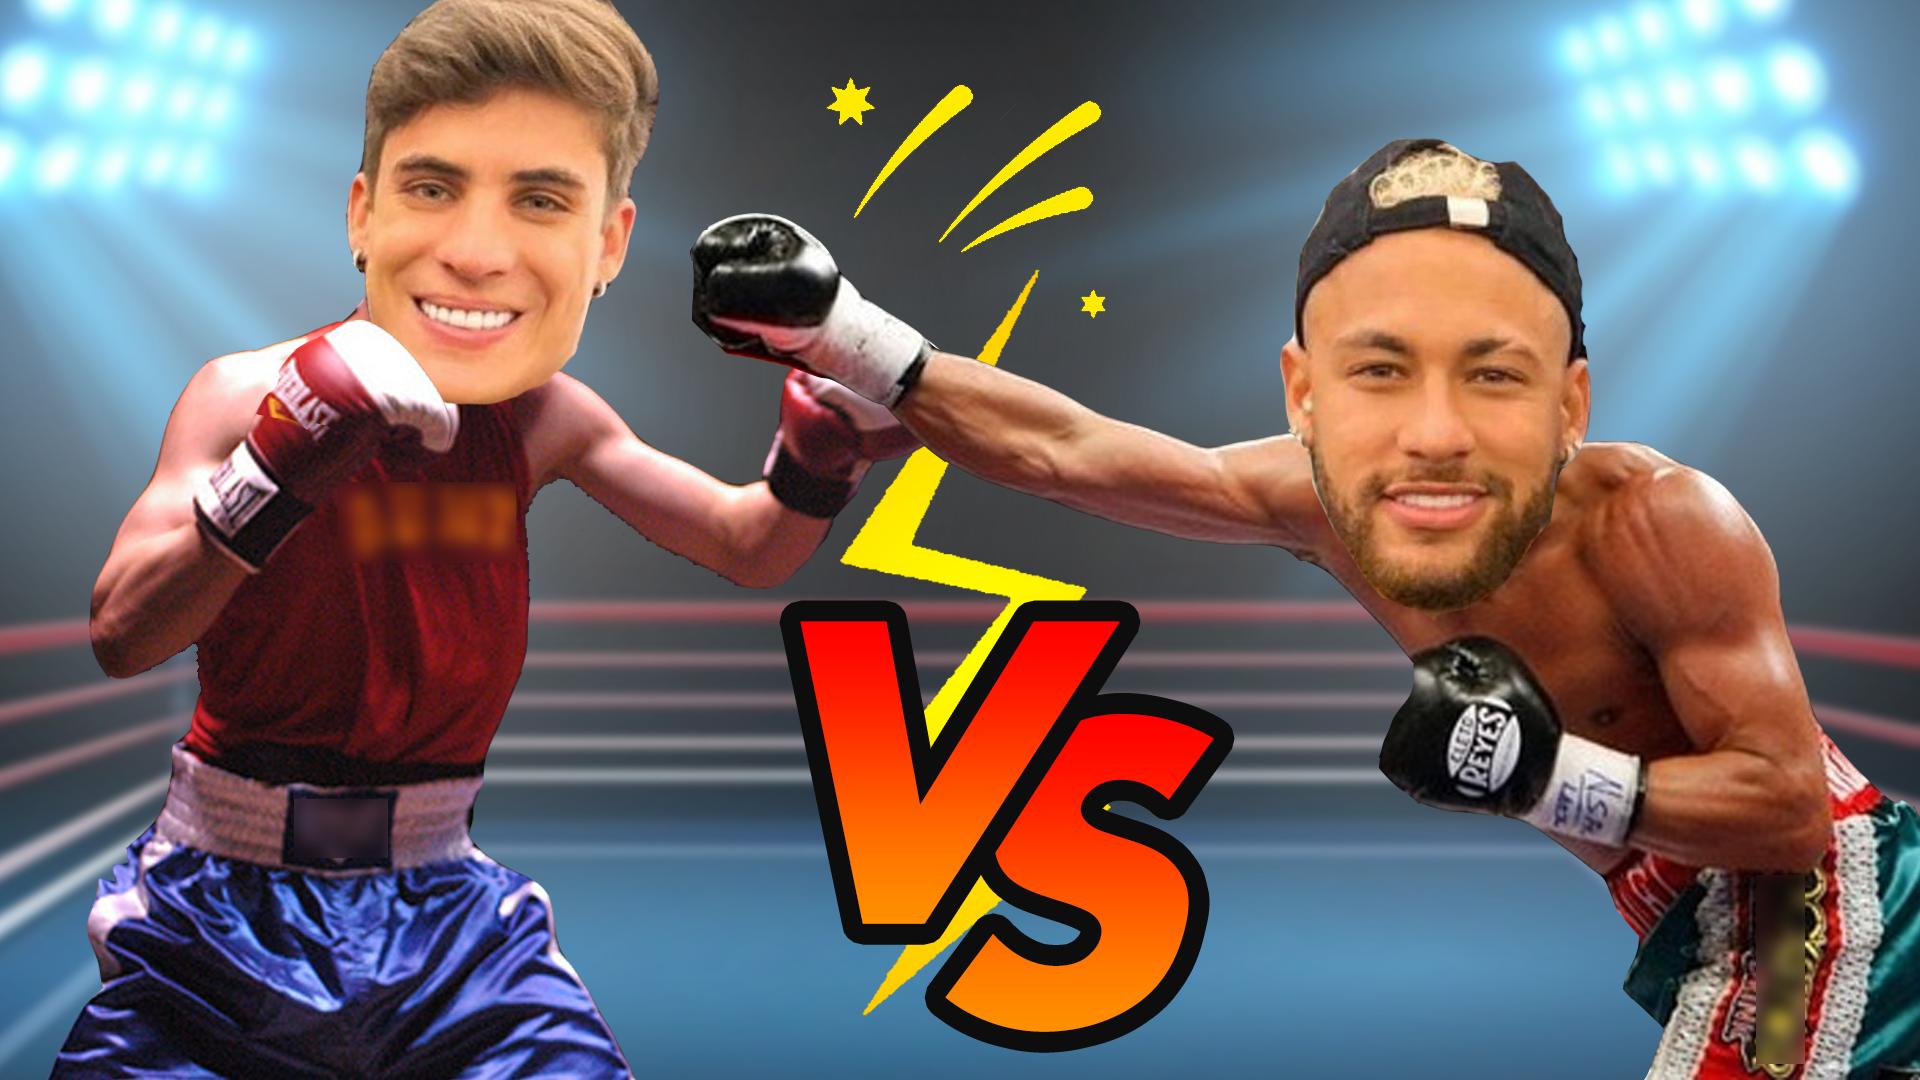 Tiago Ramos e Neymar JR